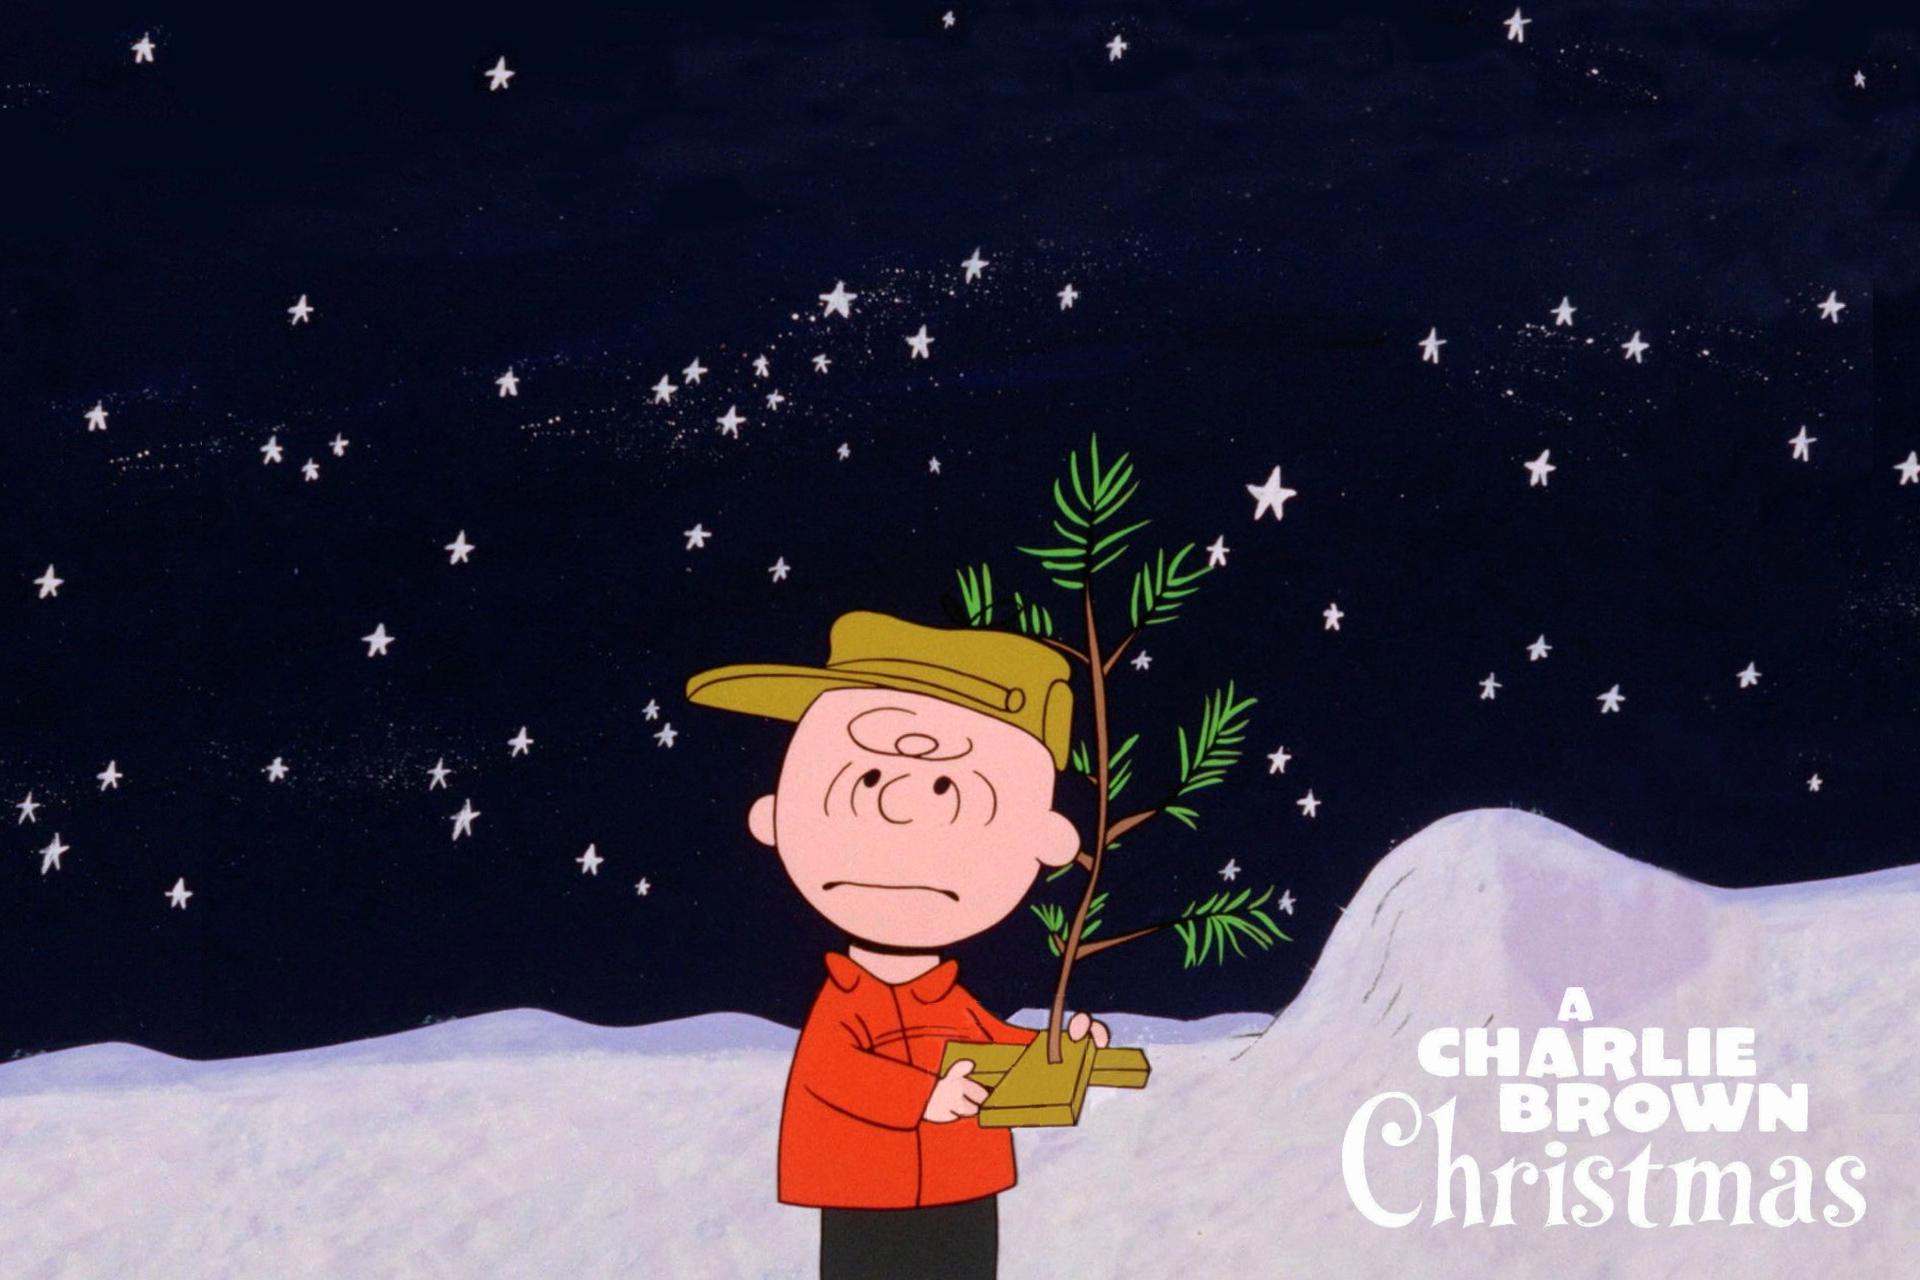 Charlie Brown Christmas Wallpaper Desktop - HD Wallpaper